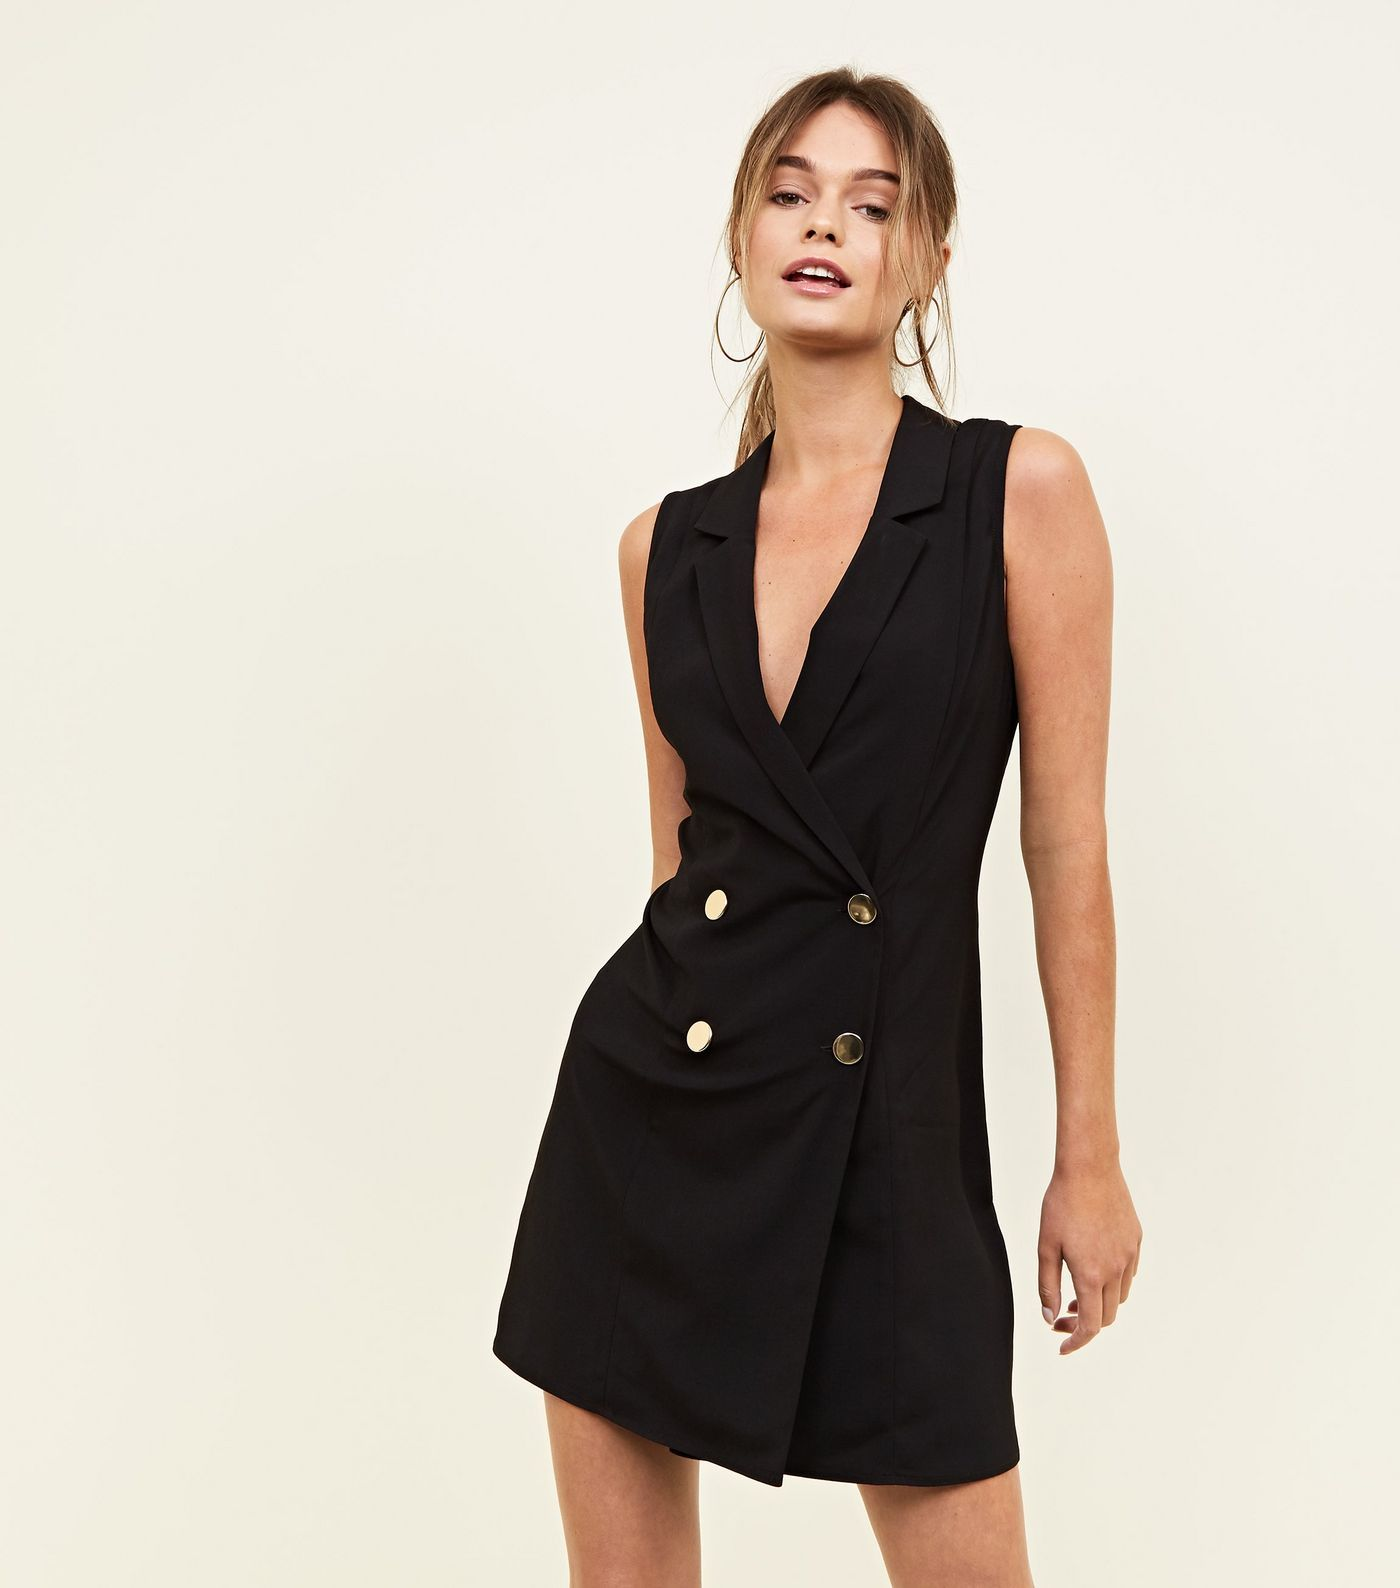 Black sleeveless tuxedo dress in clothes pinterest